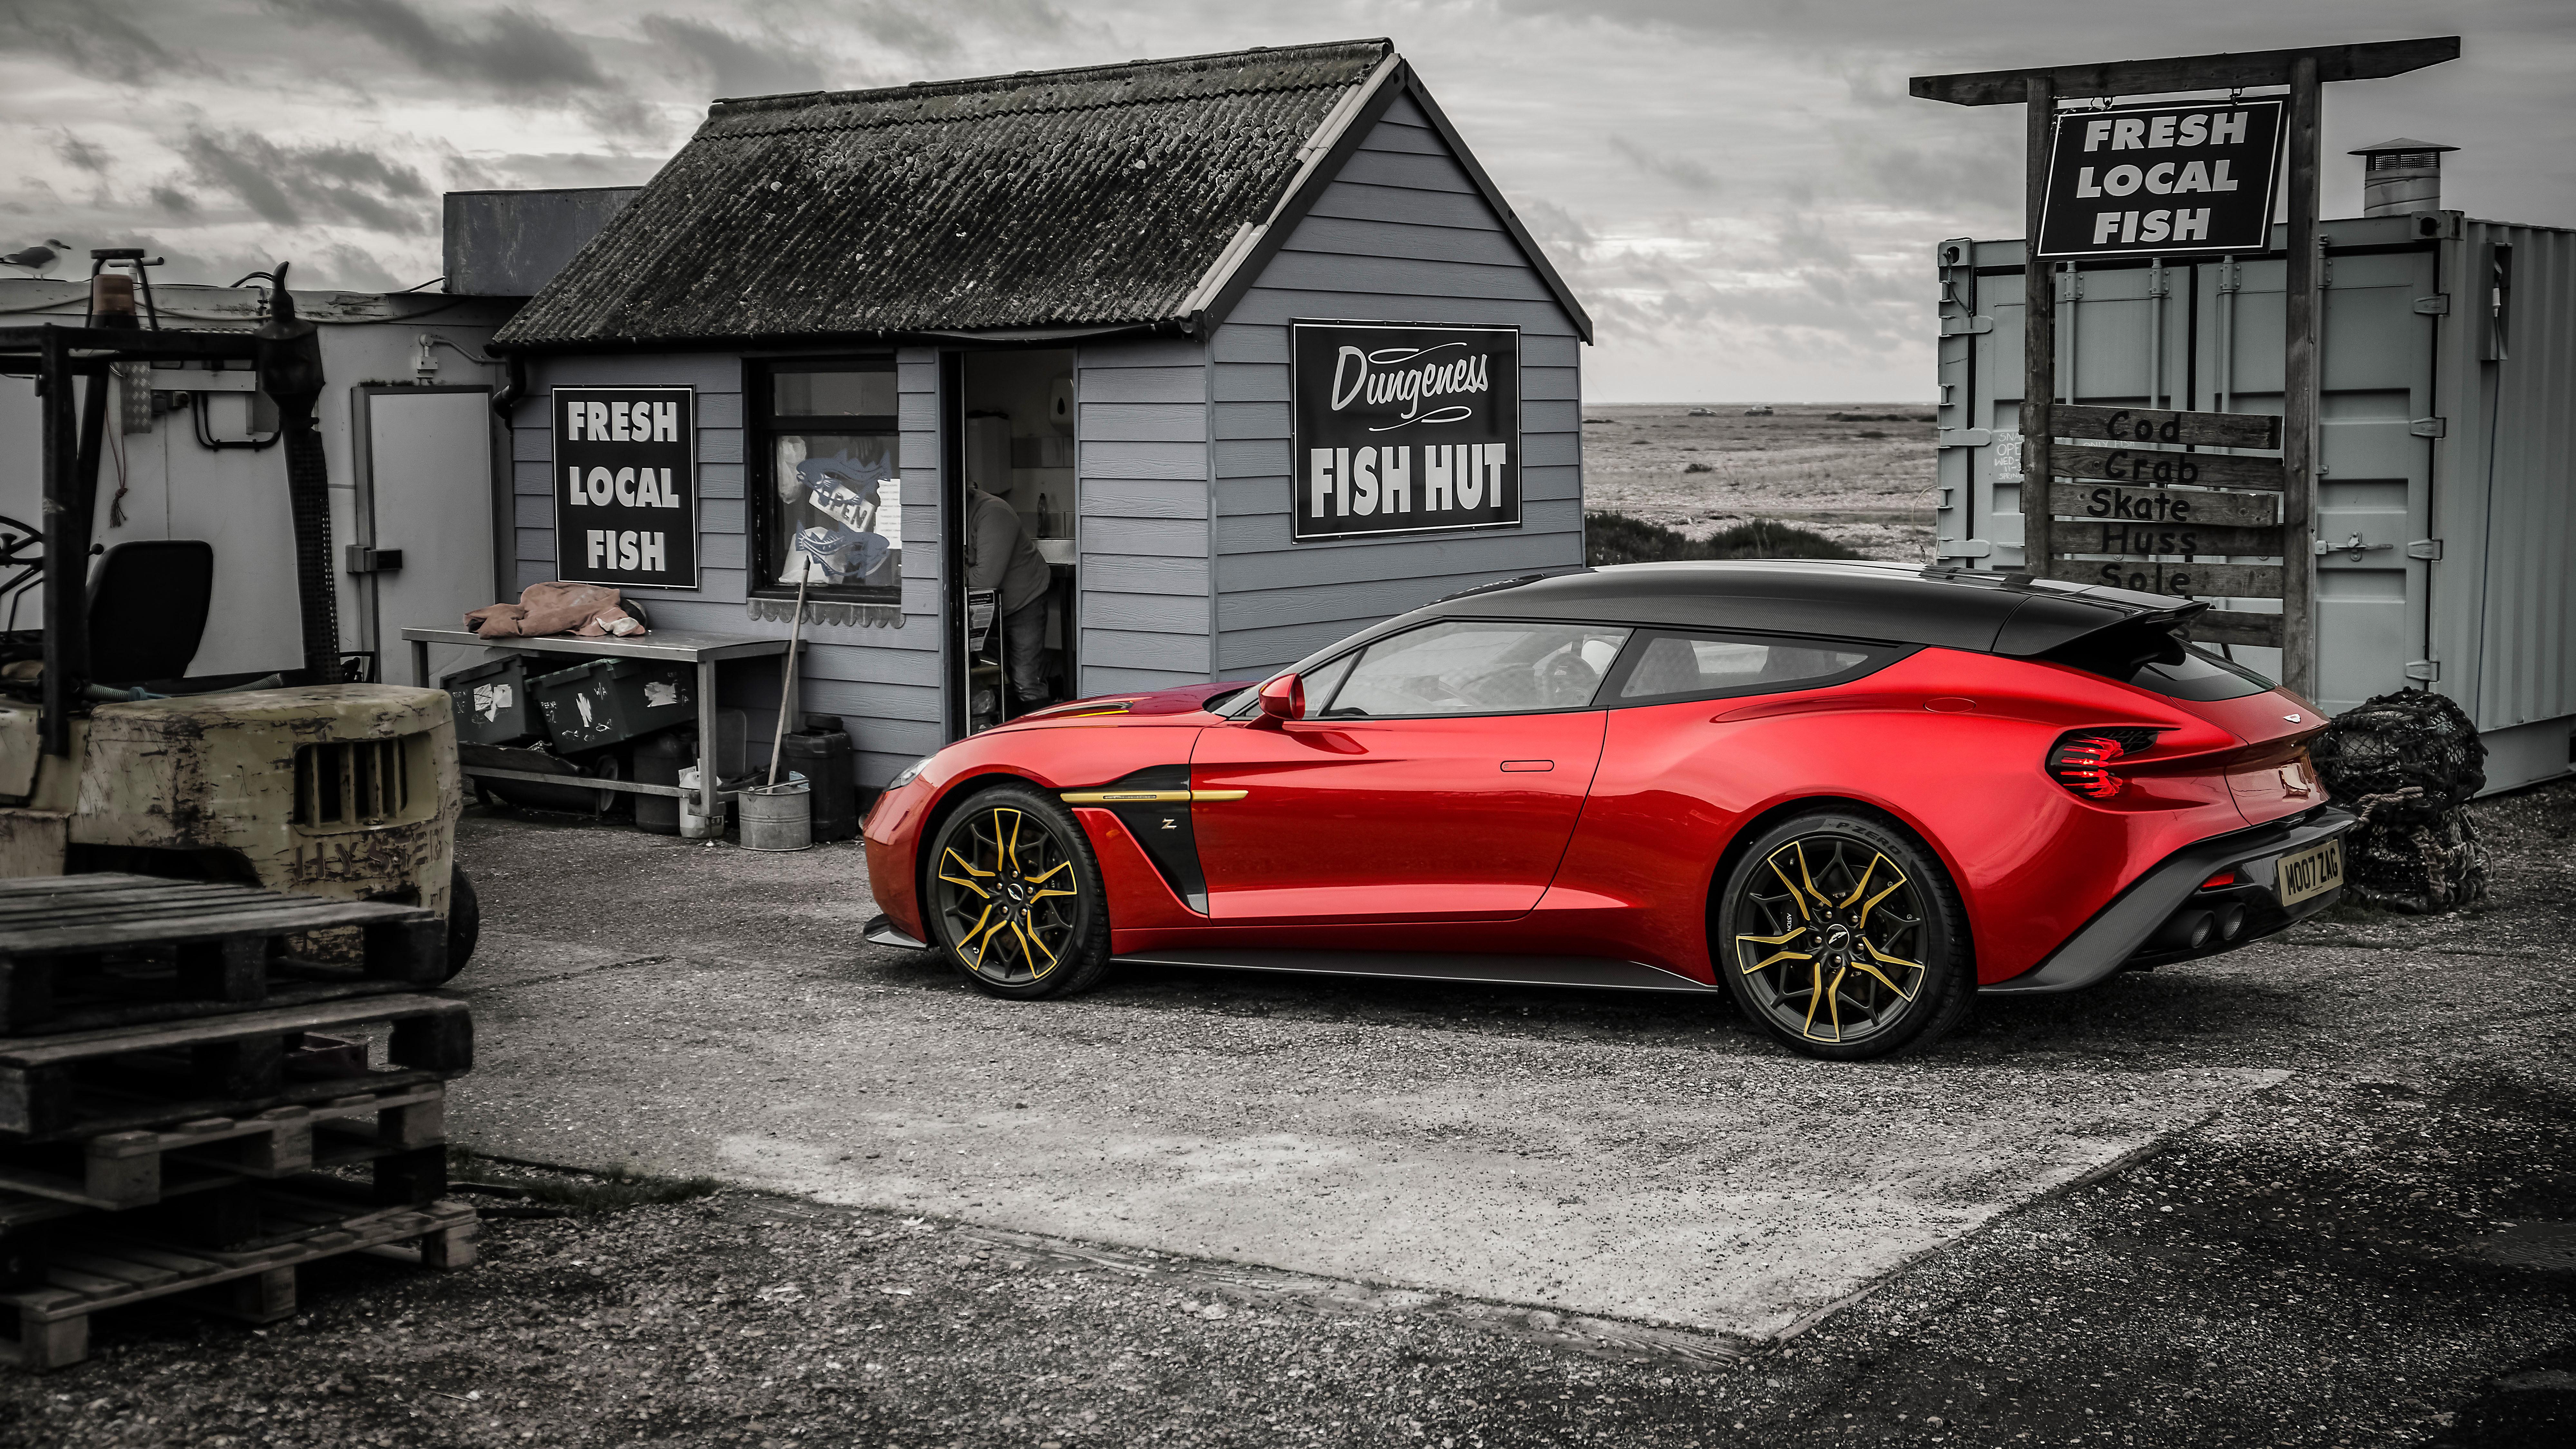 Aston Martin Vanquish Zagato 8k, HD Cars, 4k Wallpapers ...